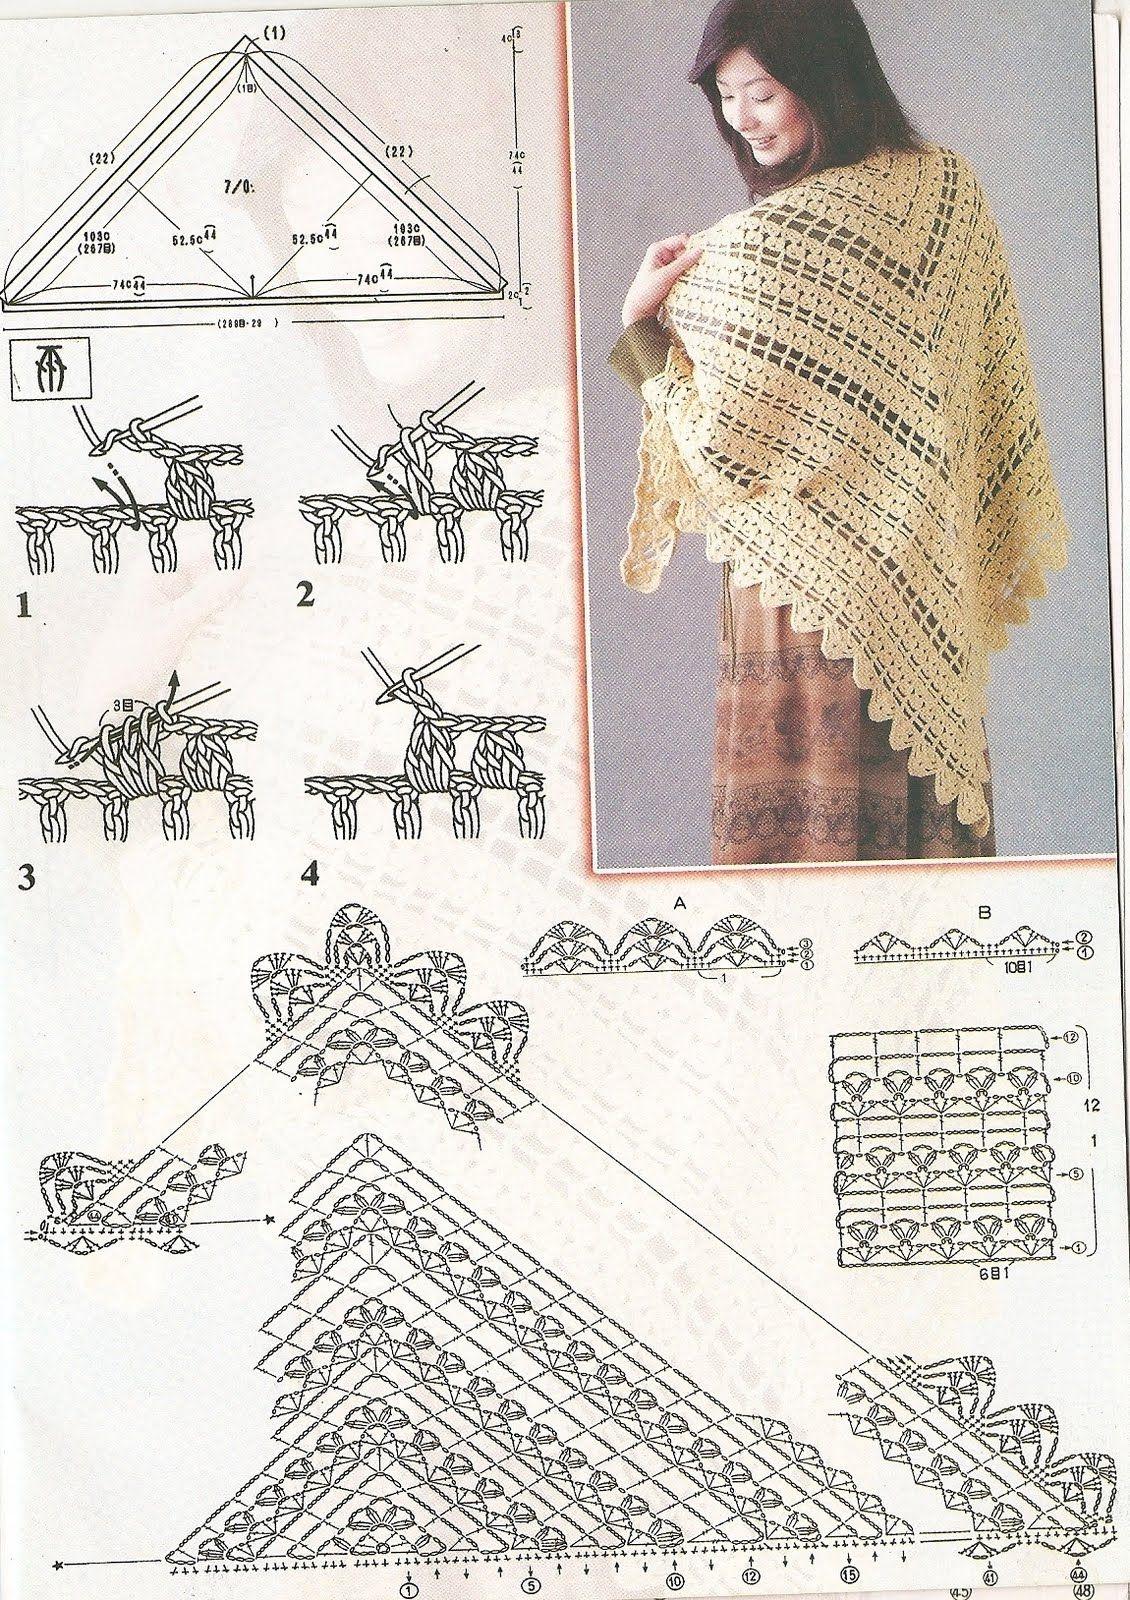 Pin de Nicole McFarlane en Yarn, yarn, and more yarn | Pinterest ...